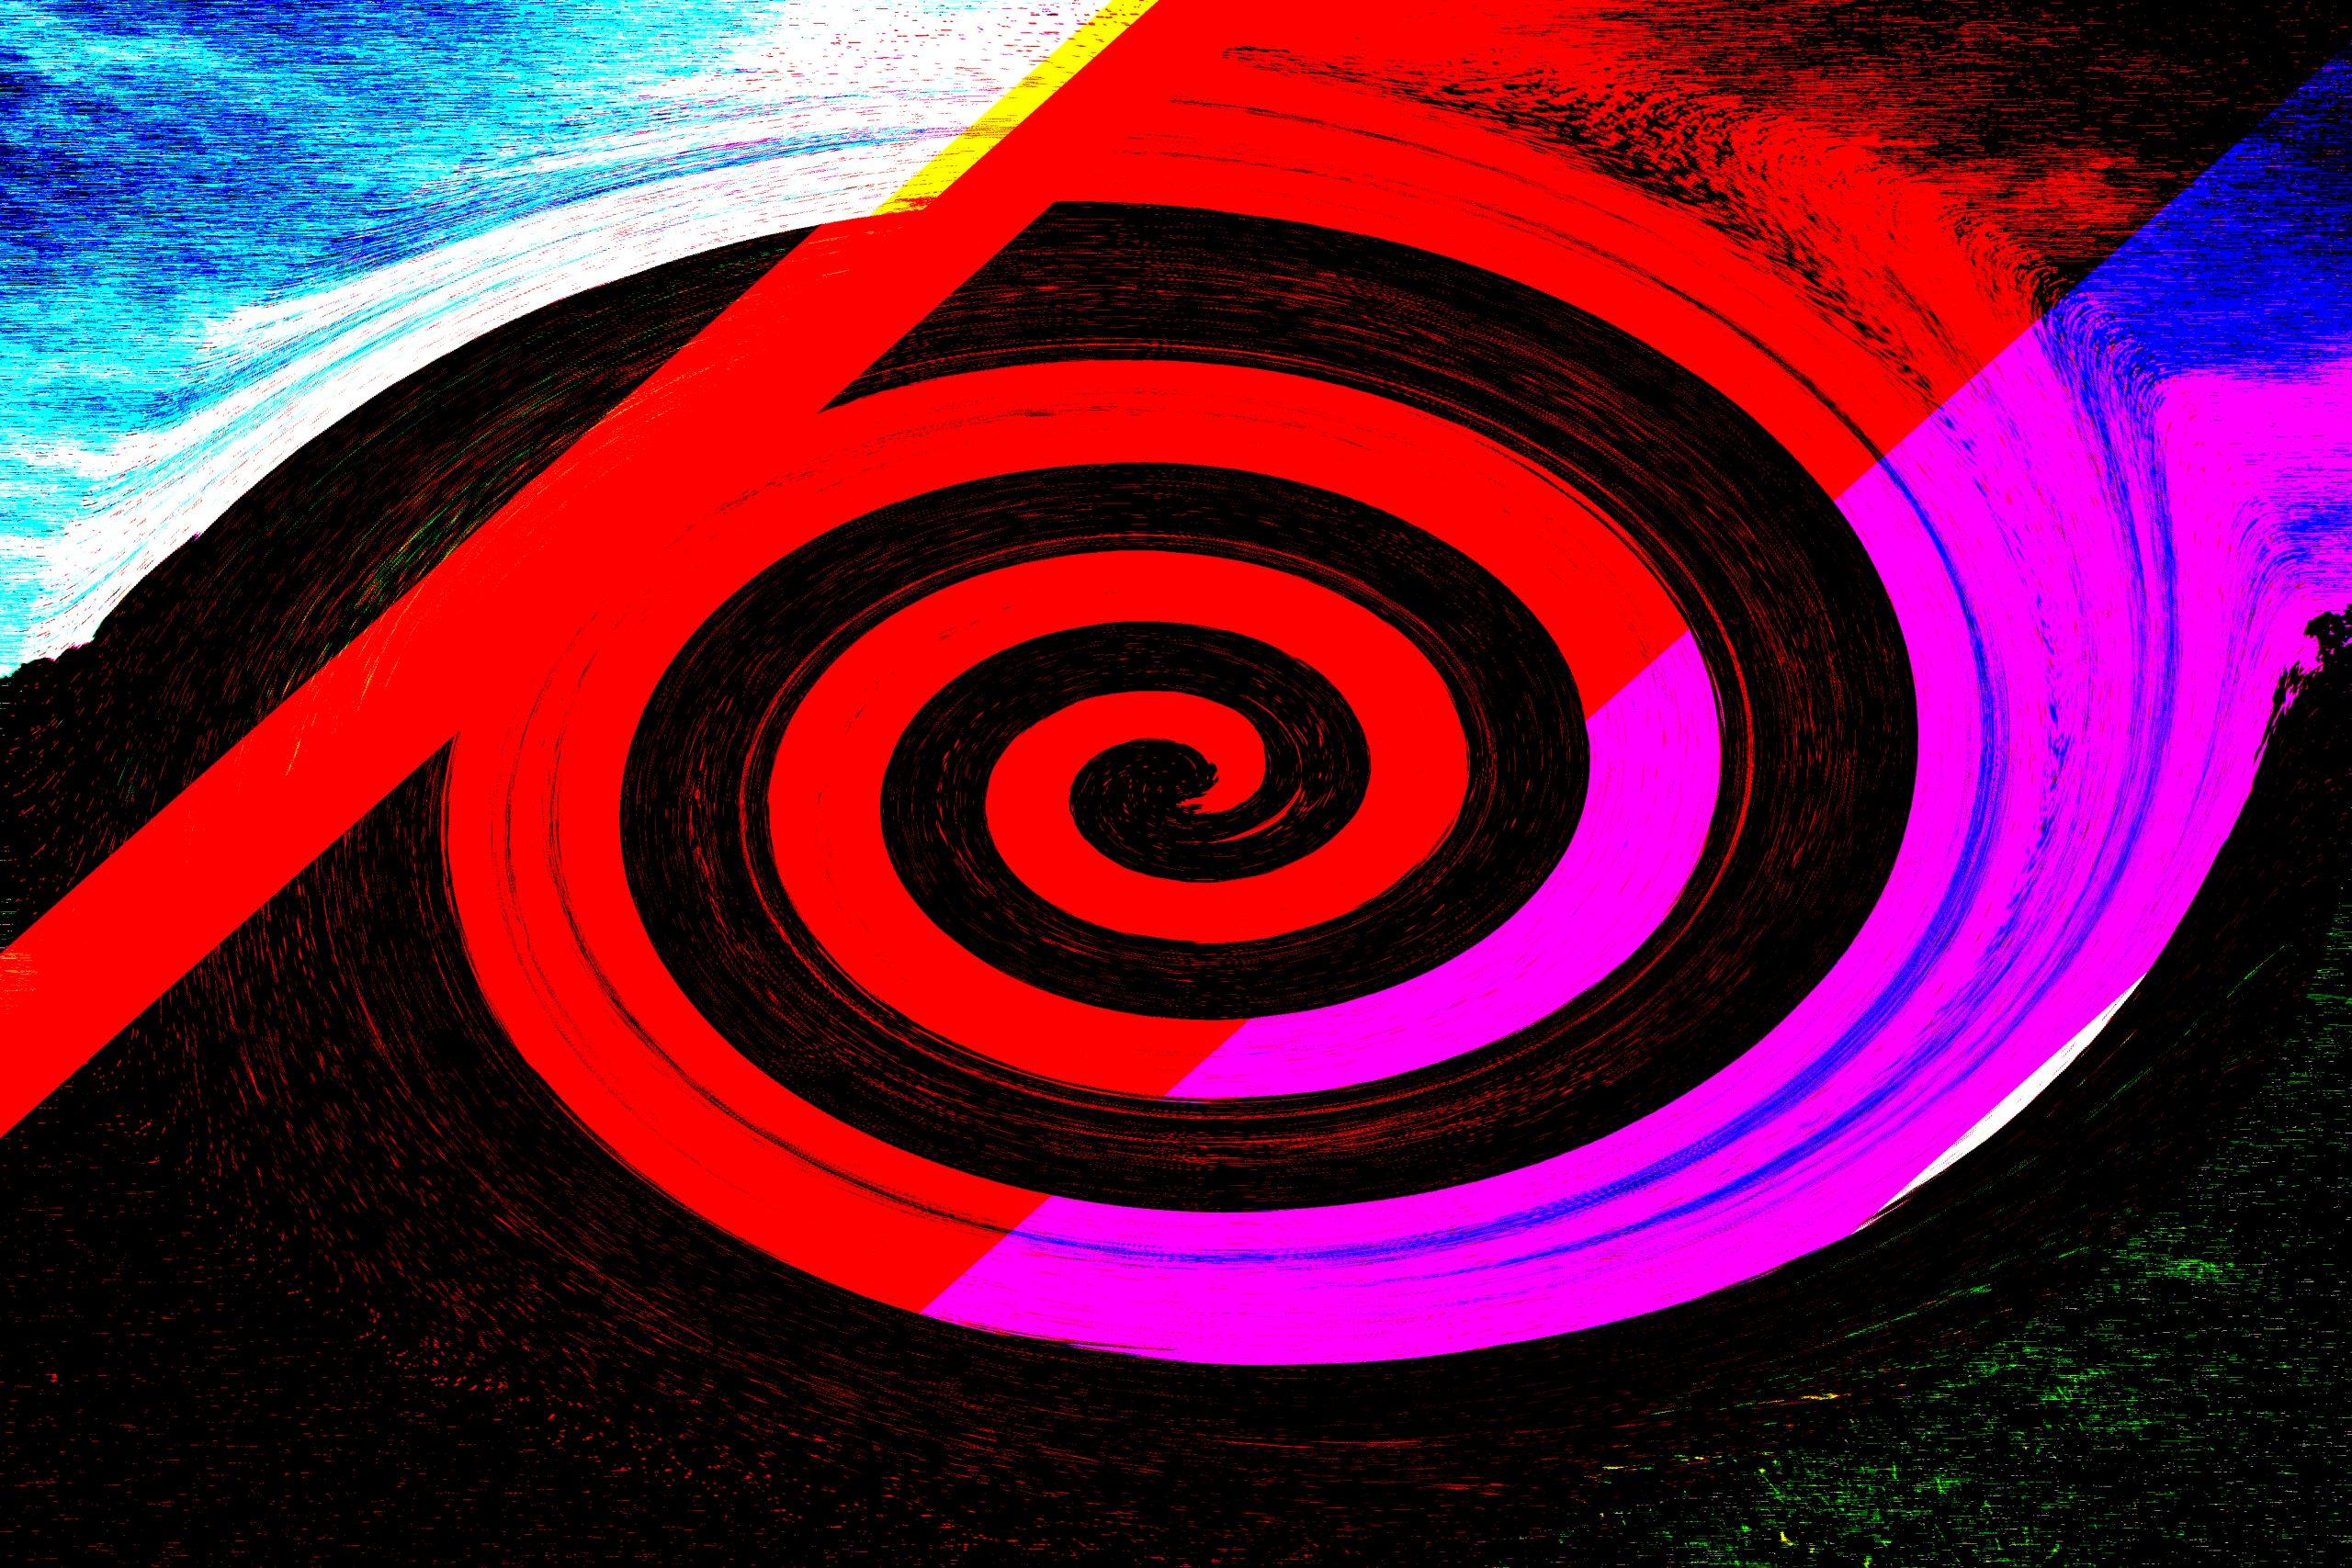 A spiral colorful design